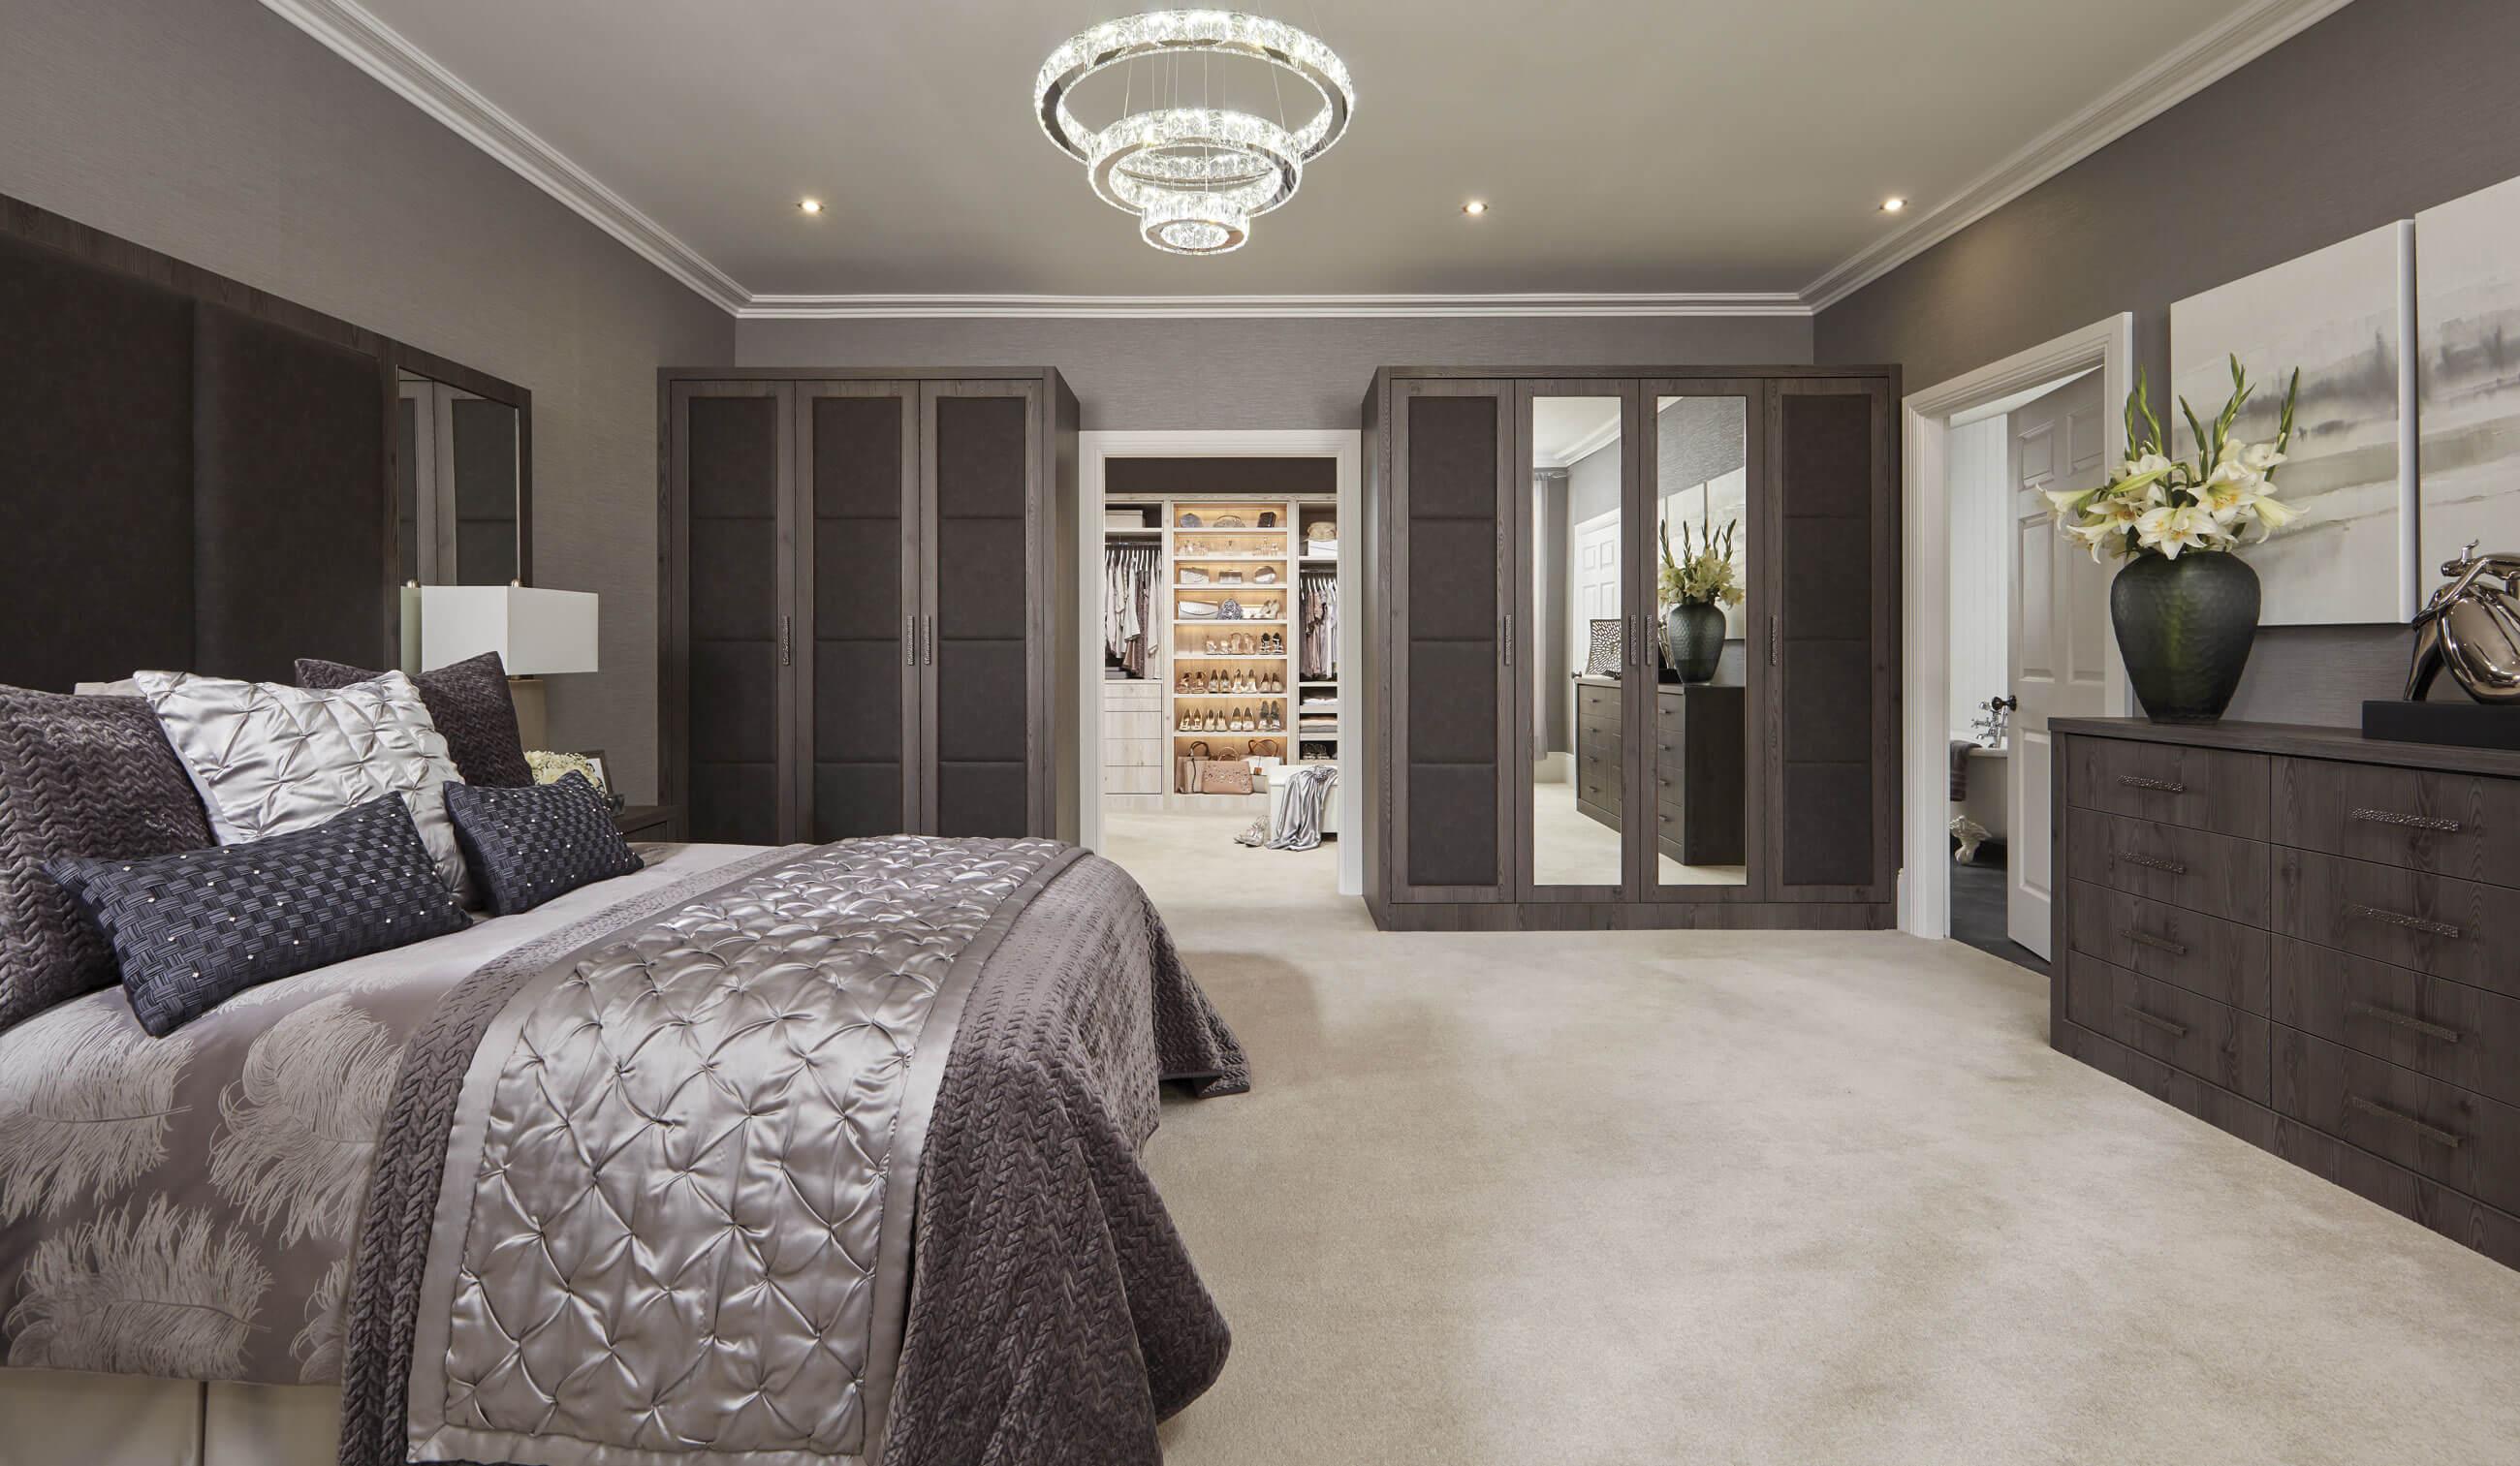 Boutique Hotel Bedroom Neville Johnson